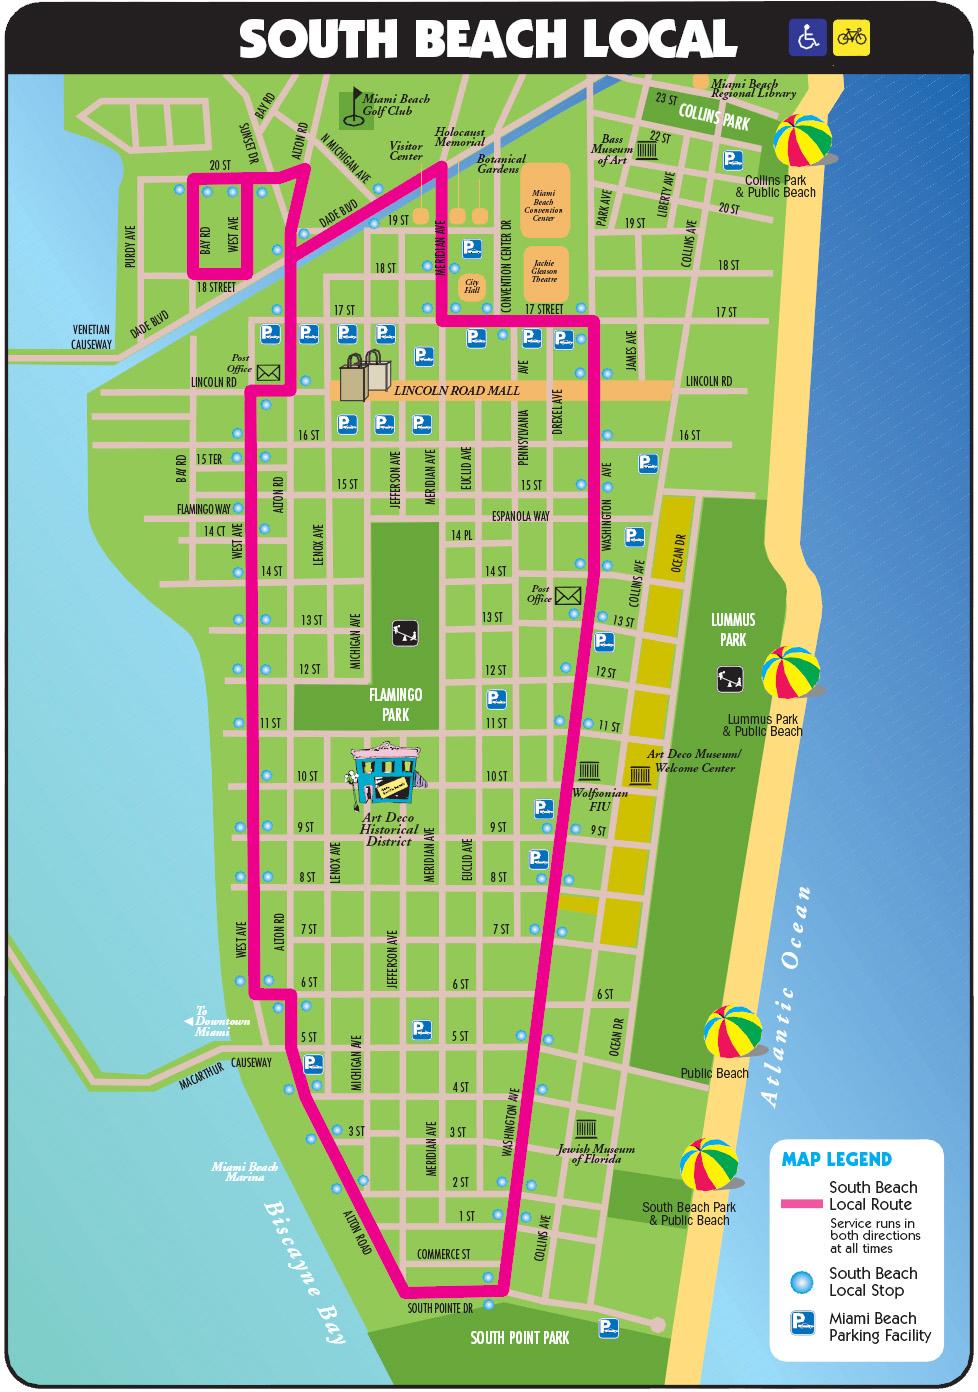 South Beach Tourist Map - Miami Beach Florida • Mappery - South Beach Florida Map